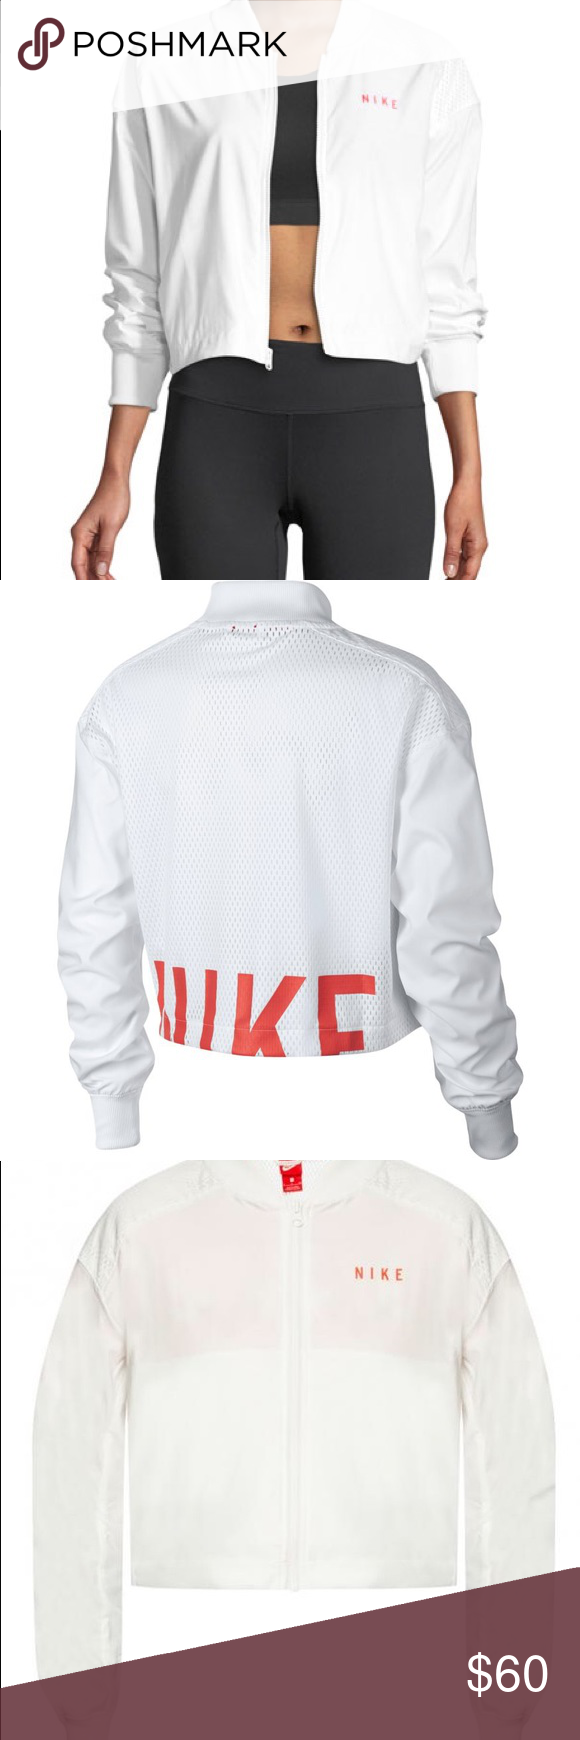 ca084b0ed2de Nike Sportswear Bomber Jacket Nike Sportswear Bomber Jacket Nike bomber  jacket with mesh paneling. Baseball collar  zip front. Long sleeves.